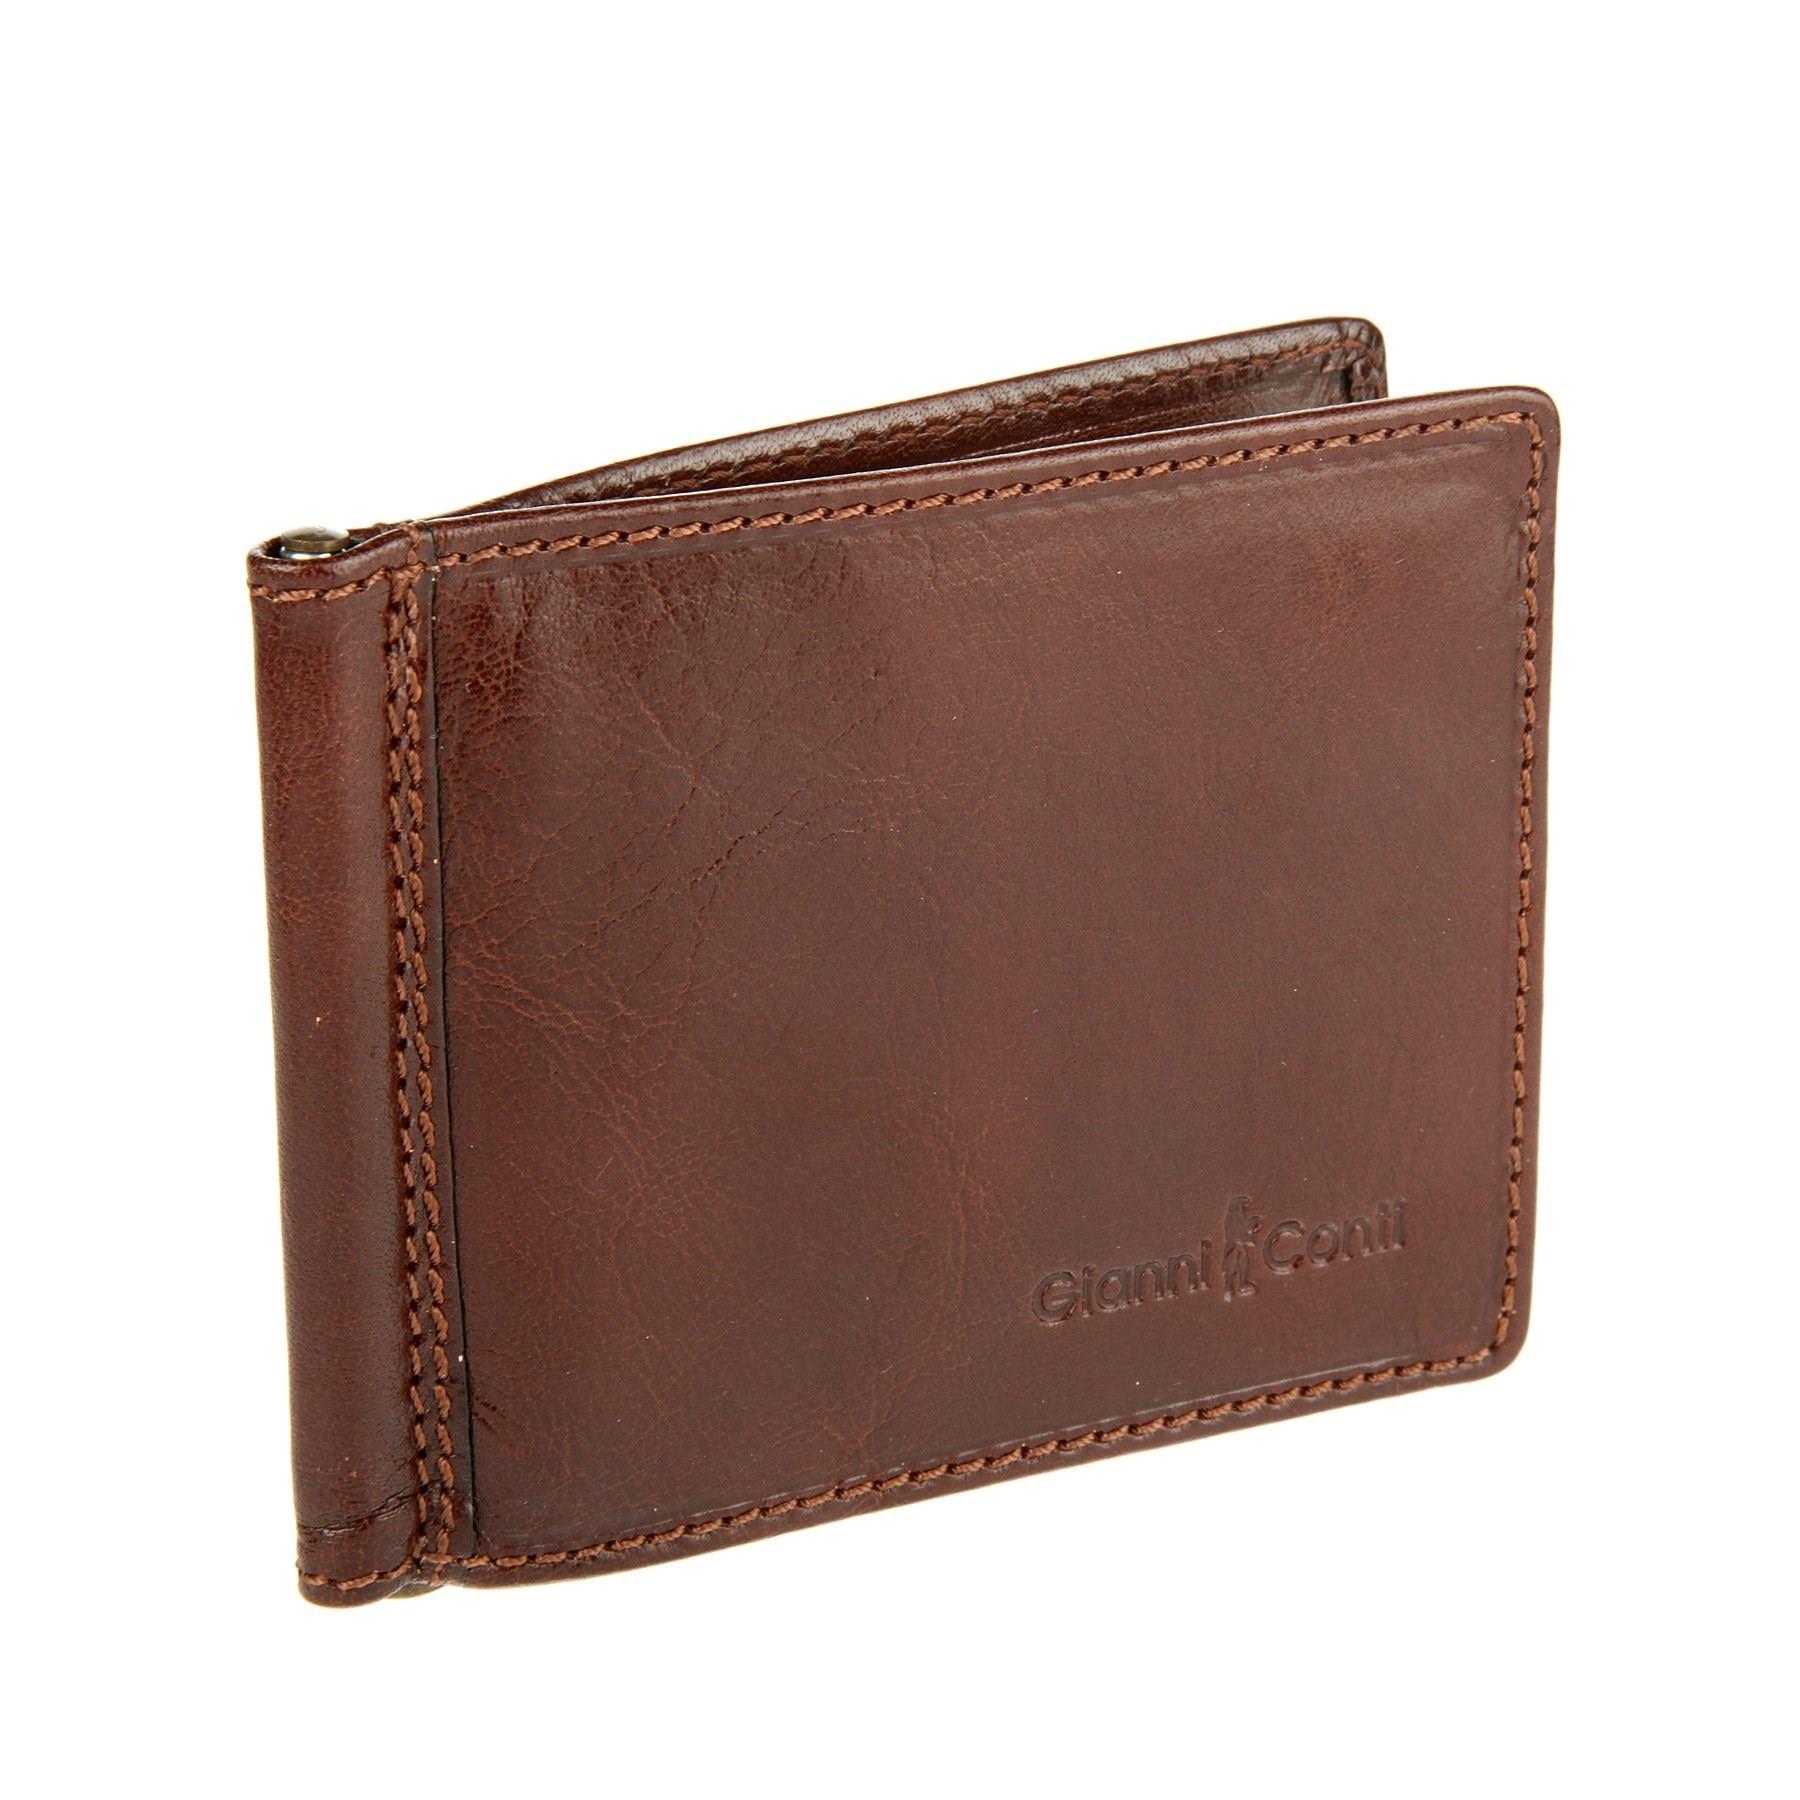 Money clip Gianni Conti 907101 Brown 2017 men leather brand luxury wallet vintage minimalist short male purses money clip credit card dollar price portomonee